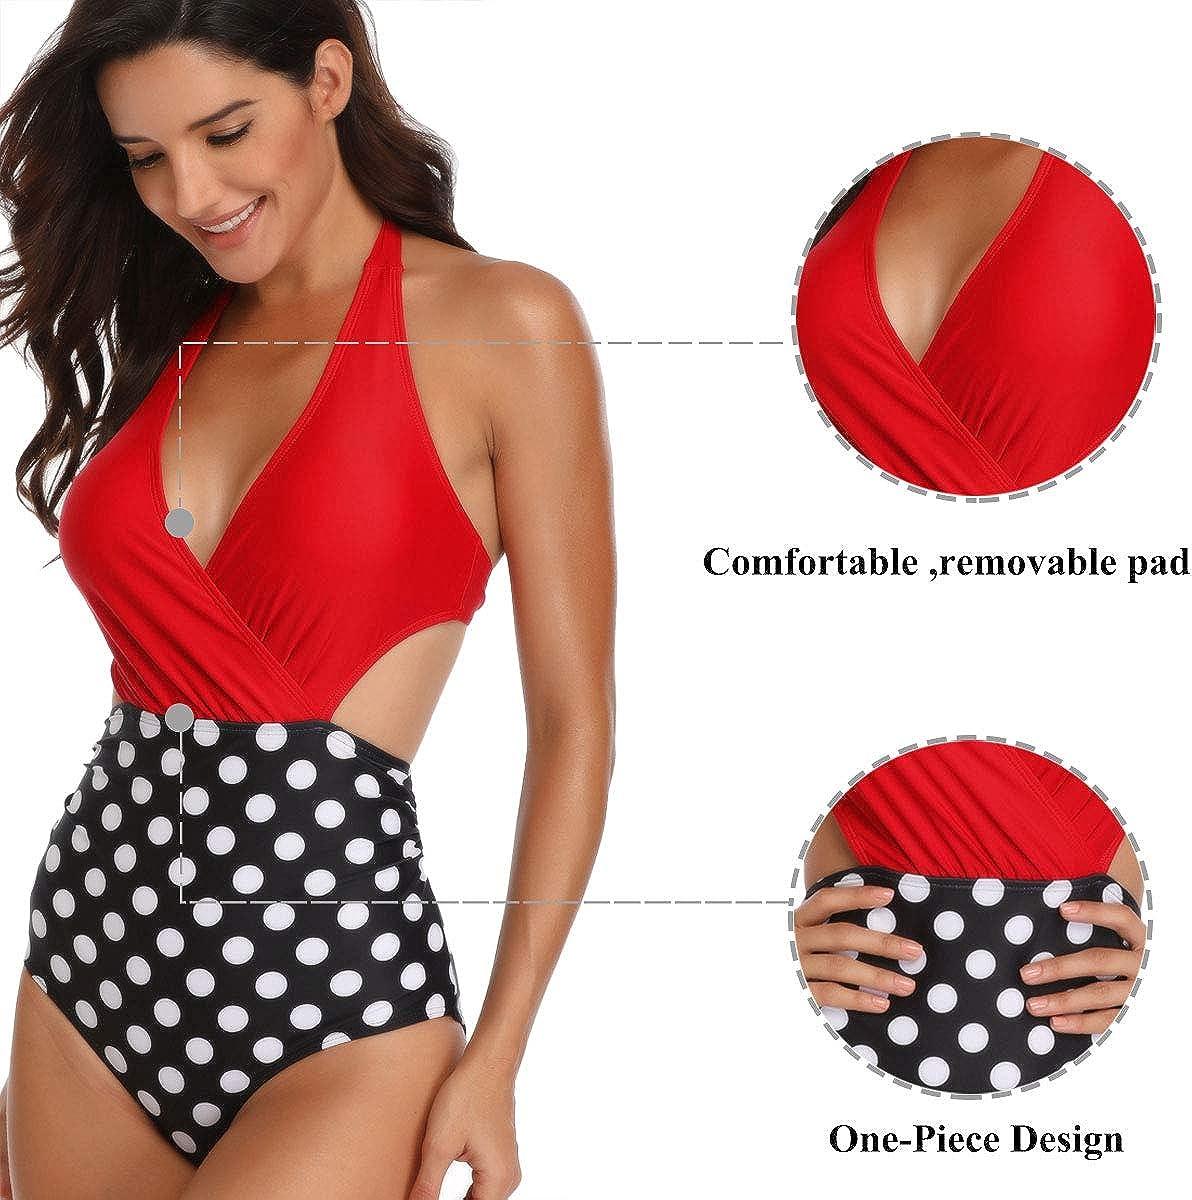 WinCret Women Swimming Costume V-Neck Halter High Waist Swimsuit One Piece Monokini Swimwear Beach Bathing Suits